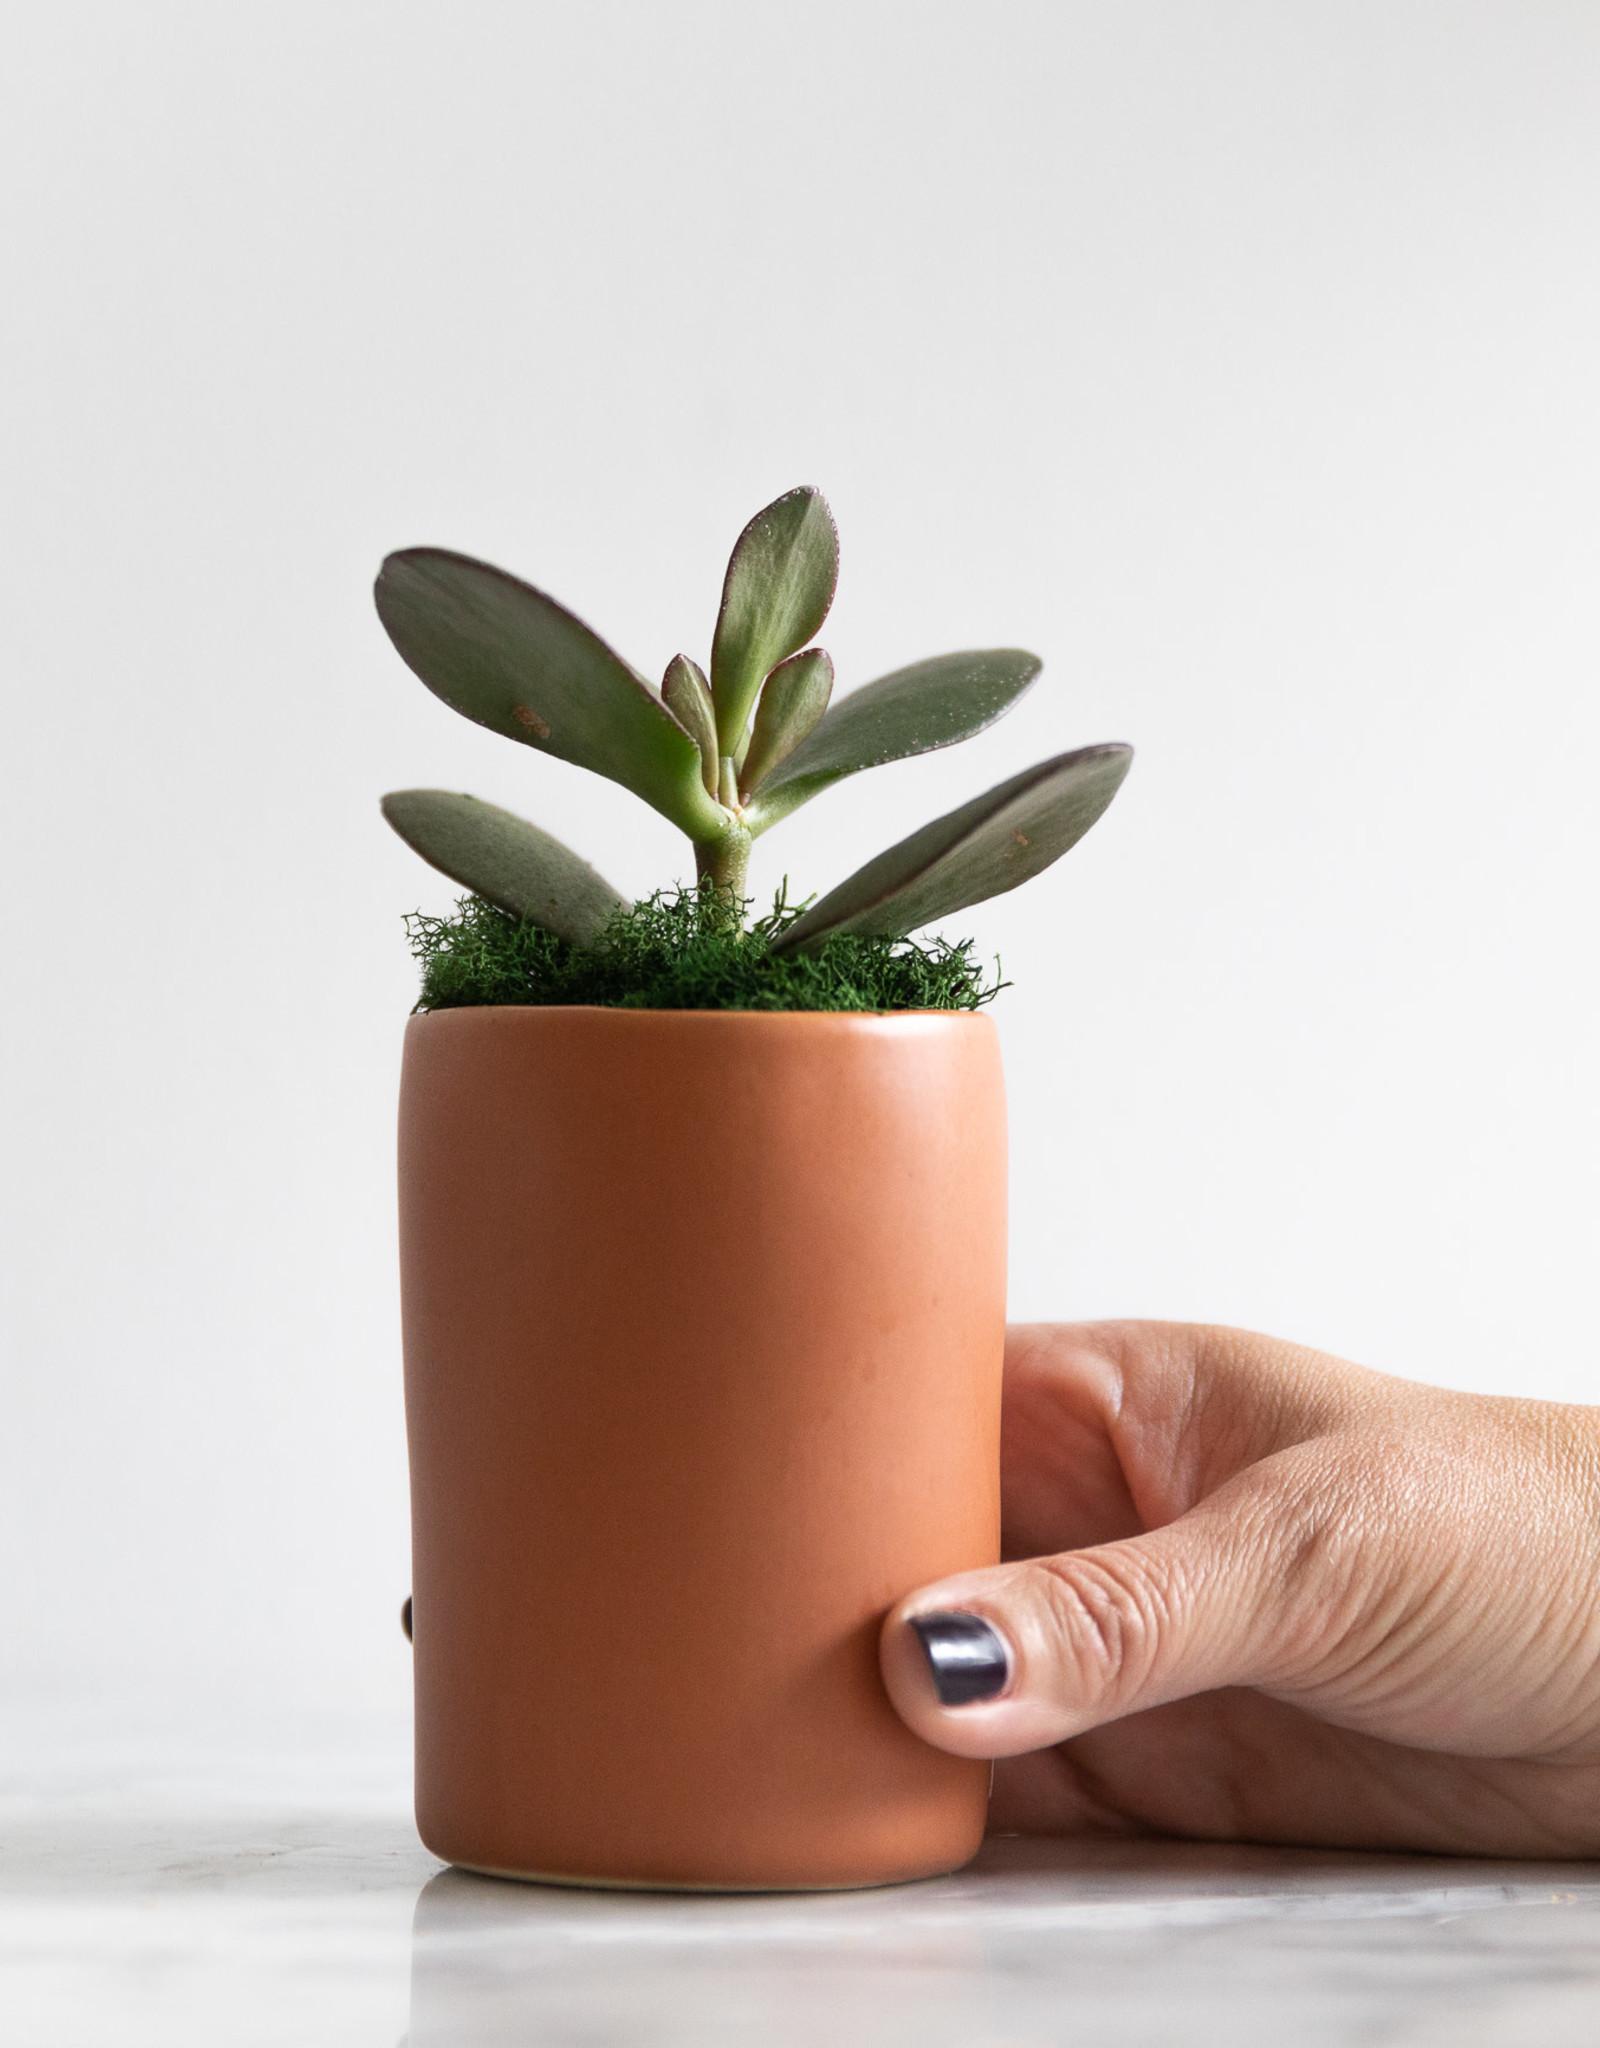 Mini Succulent  with Planter #4